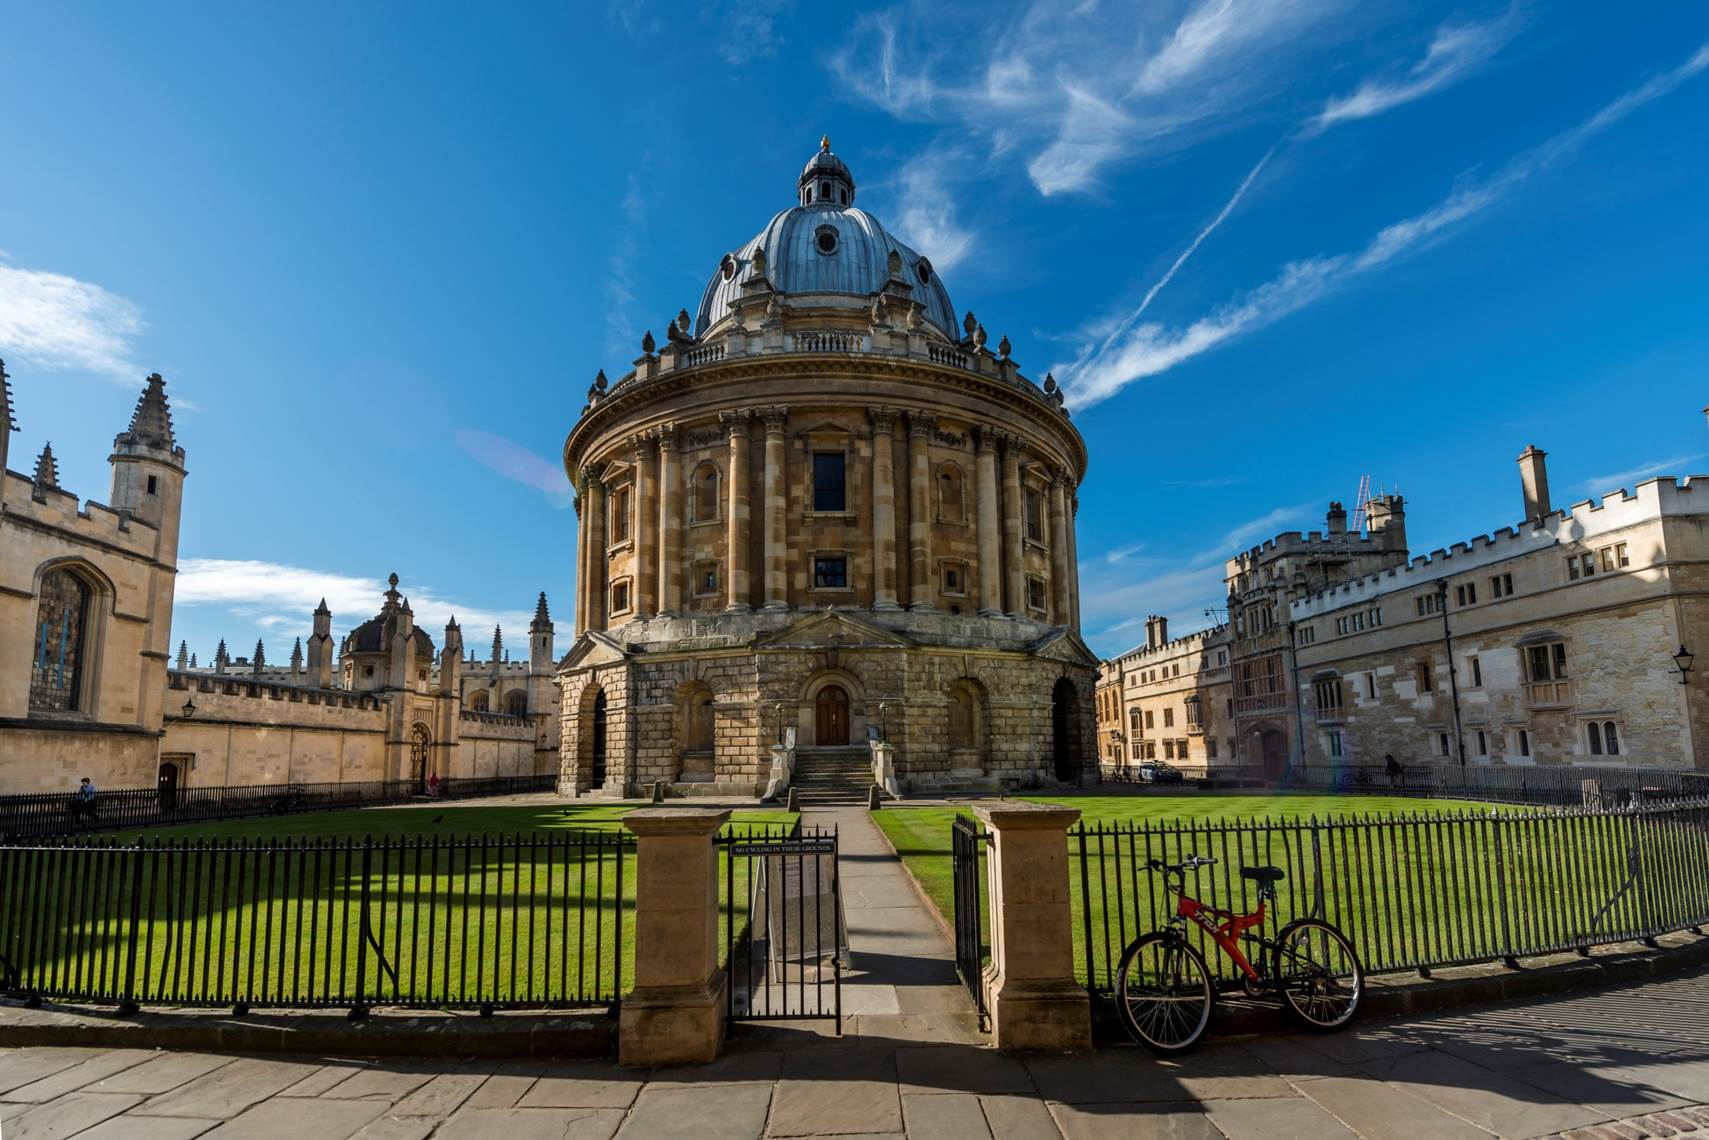 Statement from Professor Ewan McKendrick, Registrar of Oxford University